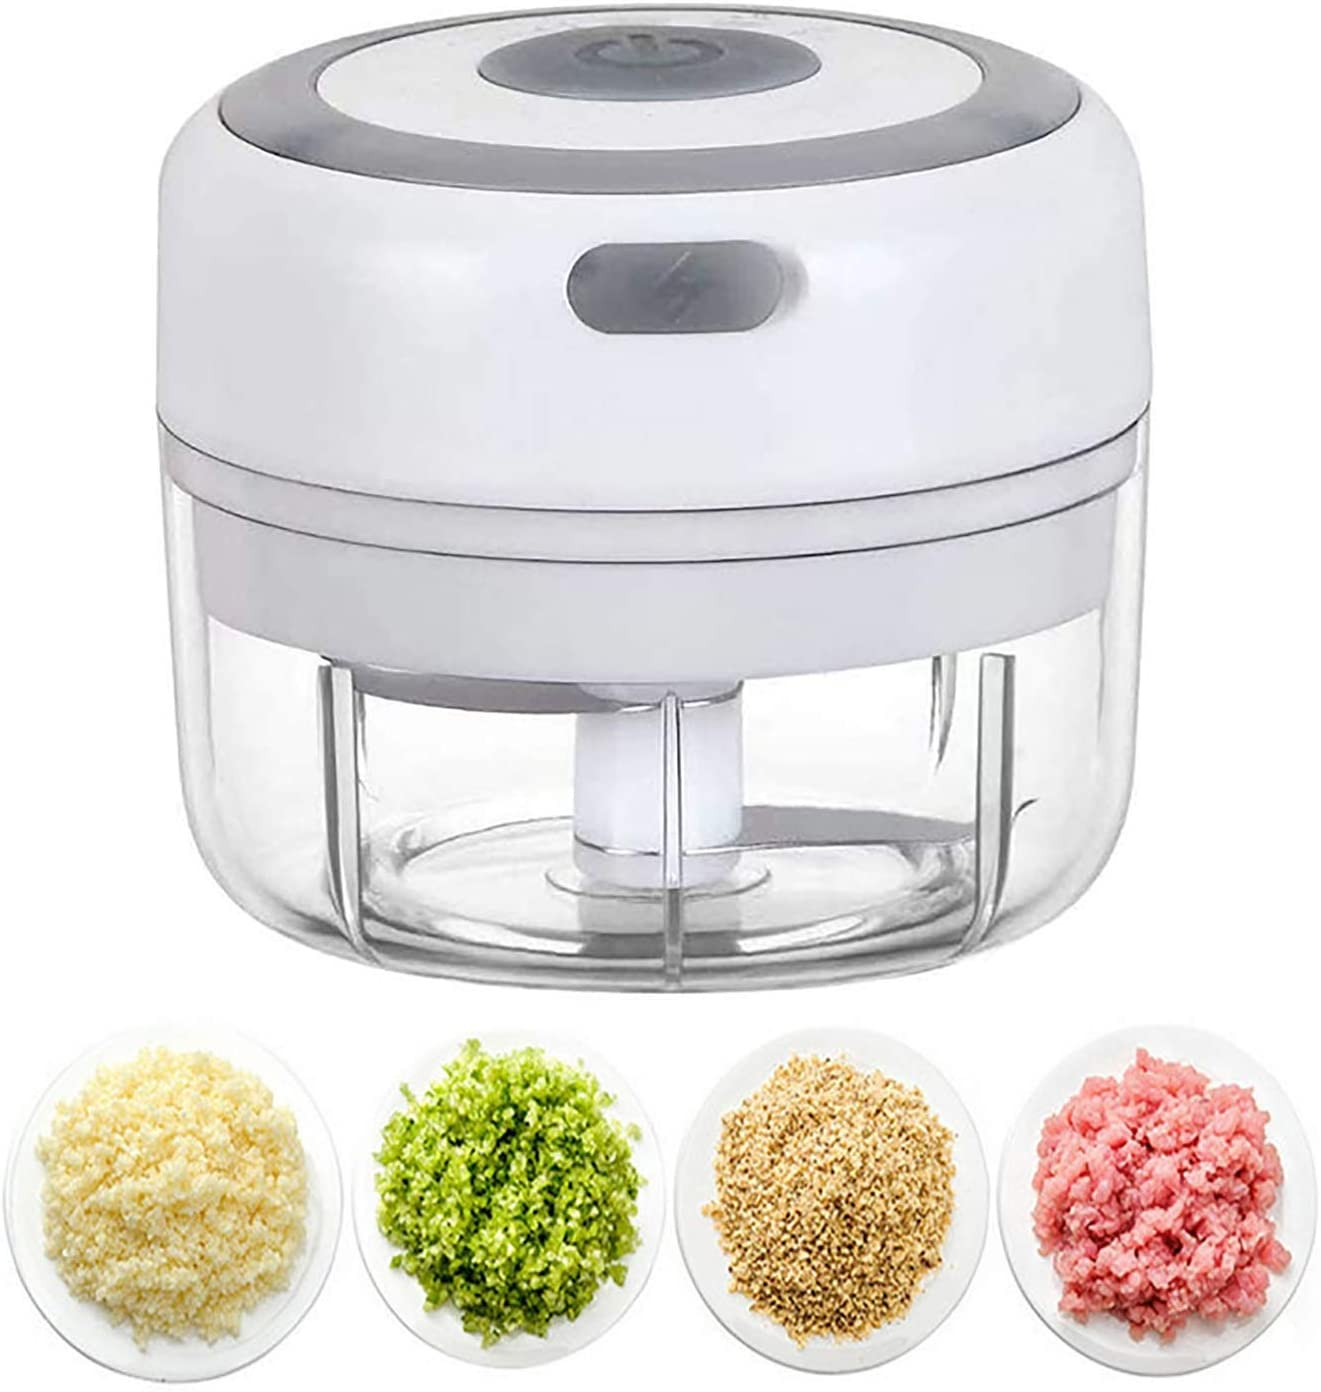 Mini Electric Garlic Chopper, Rechargeable Garlic Mincer Onion Carrot Nuts Chopper Blender Grinder Food Processor Kitchen Tool,100ML